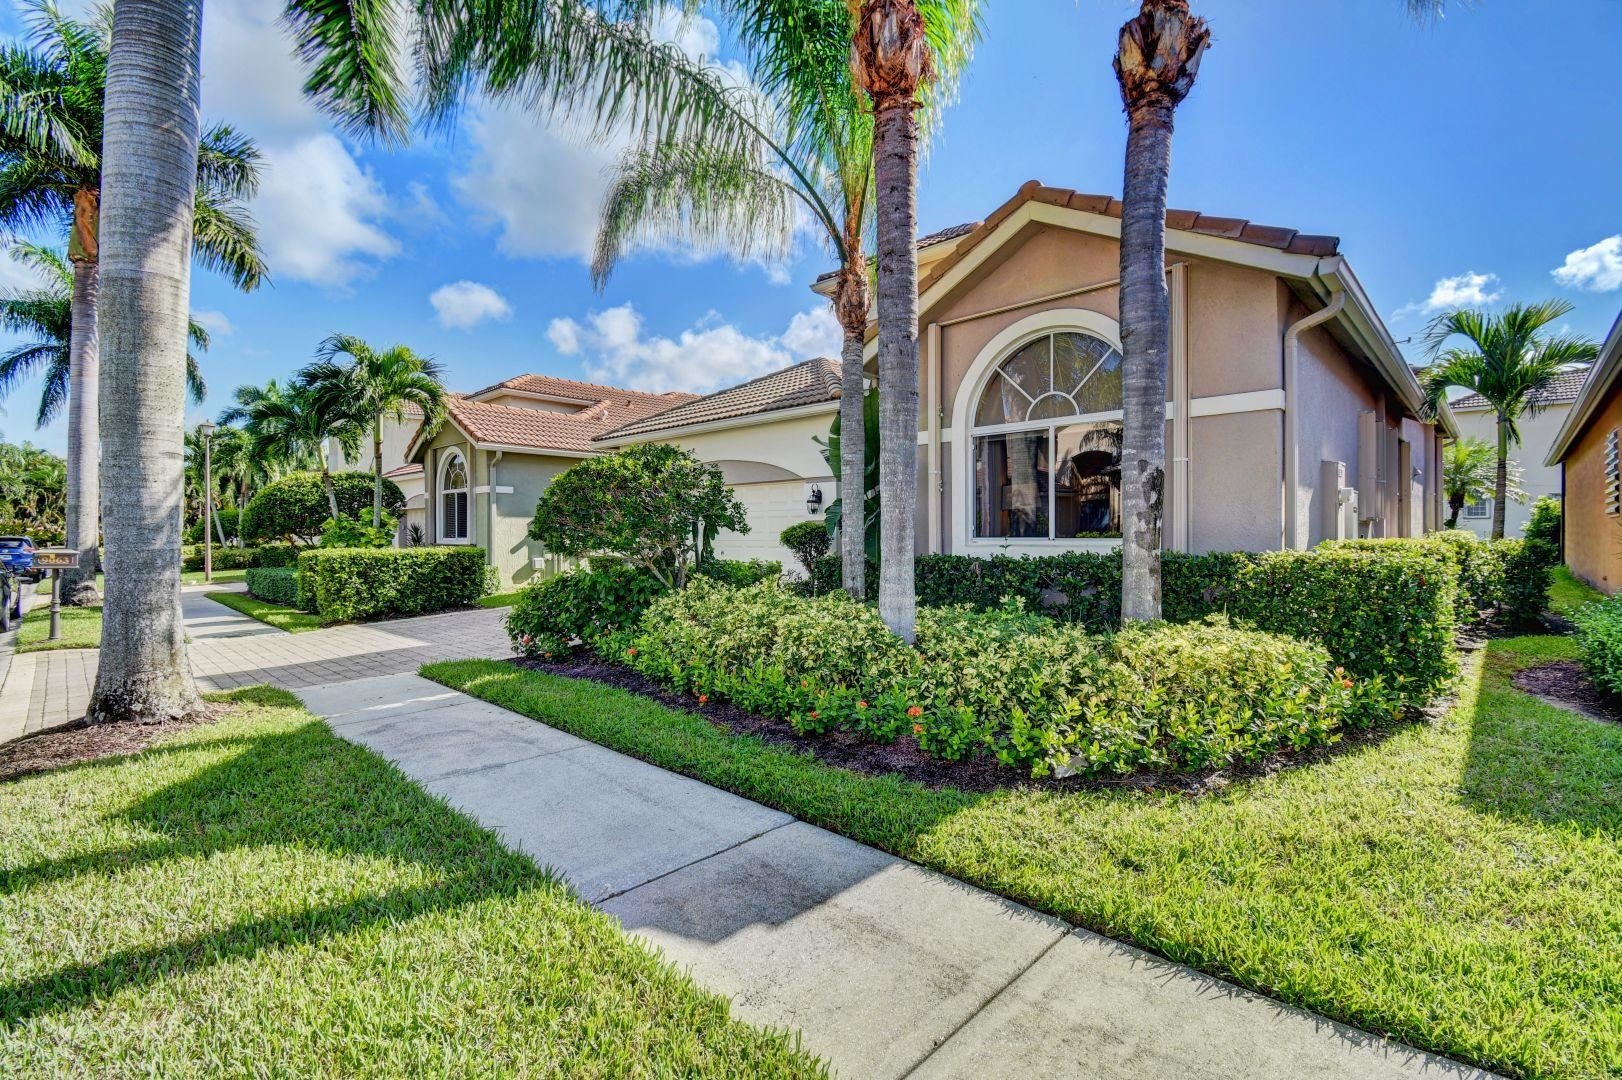 9063 Sand Pine Lane, West Palm Beach, FL 33412 - MLS#: RX-10574042